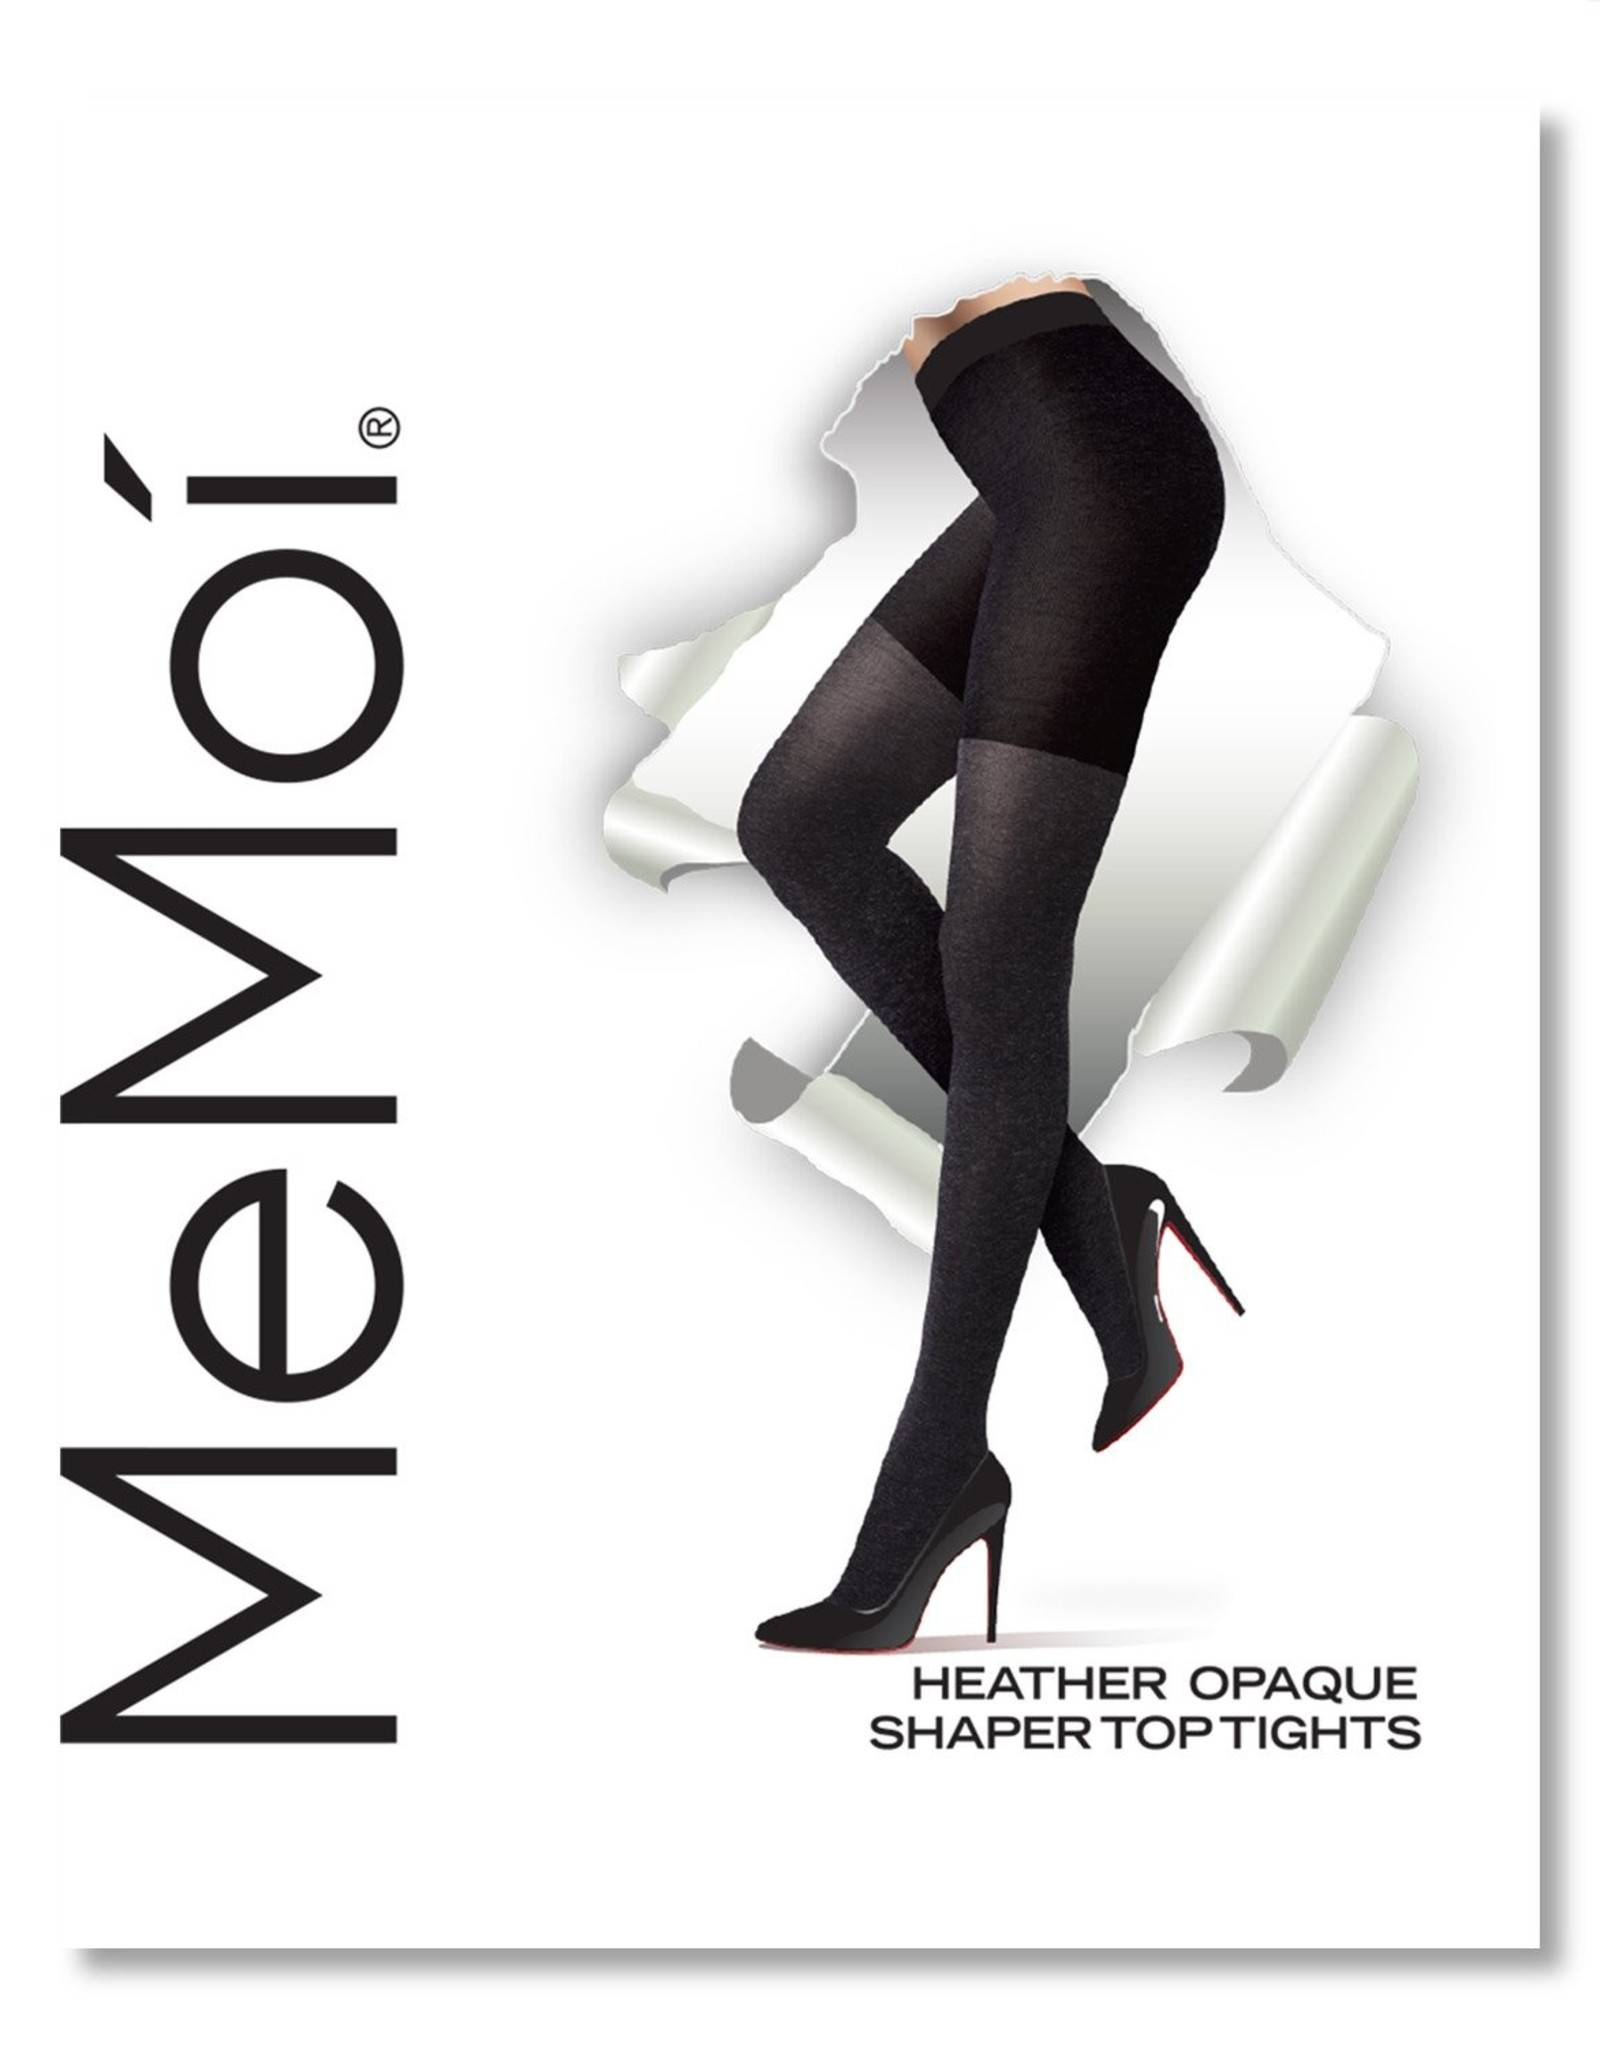 Memoi Memoi Heather Opaque Shaper Tights